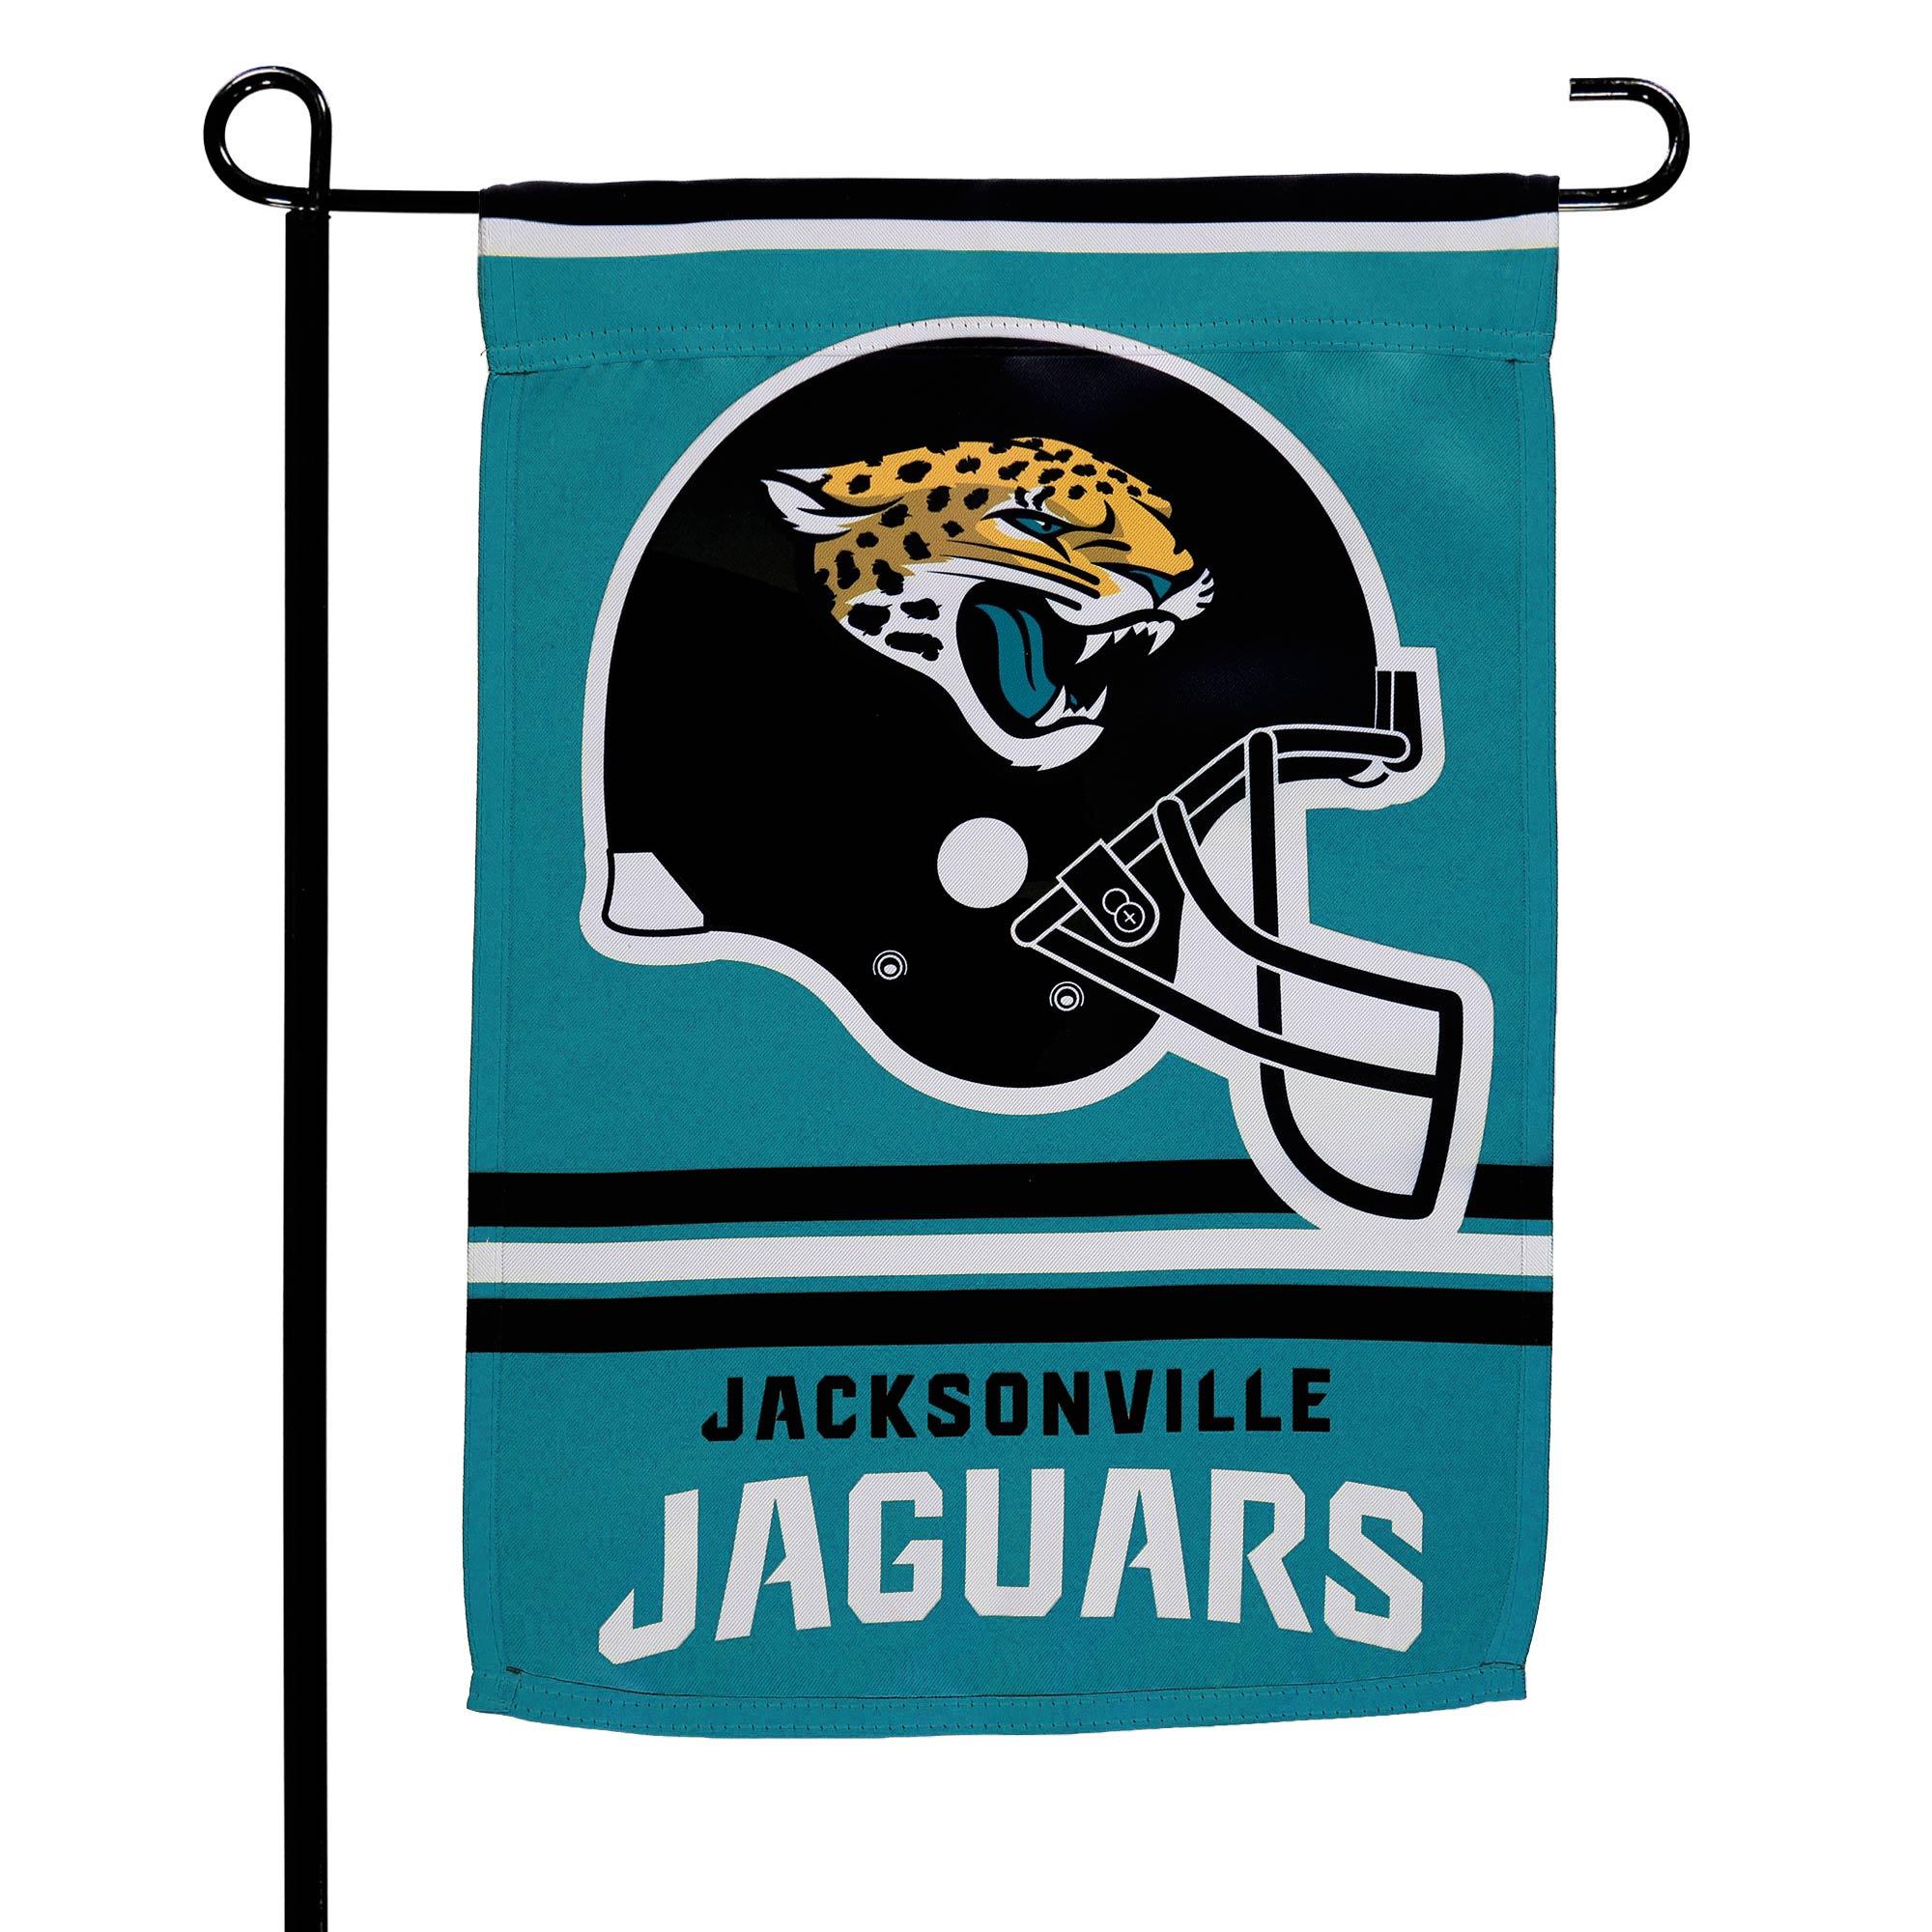 "Jacksonville Jaguars WinCraft 12"" x 18"" Double-Sided Garden Flag"